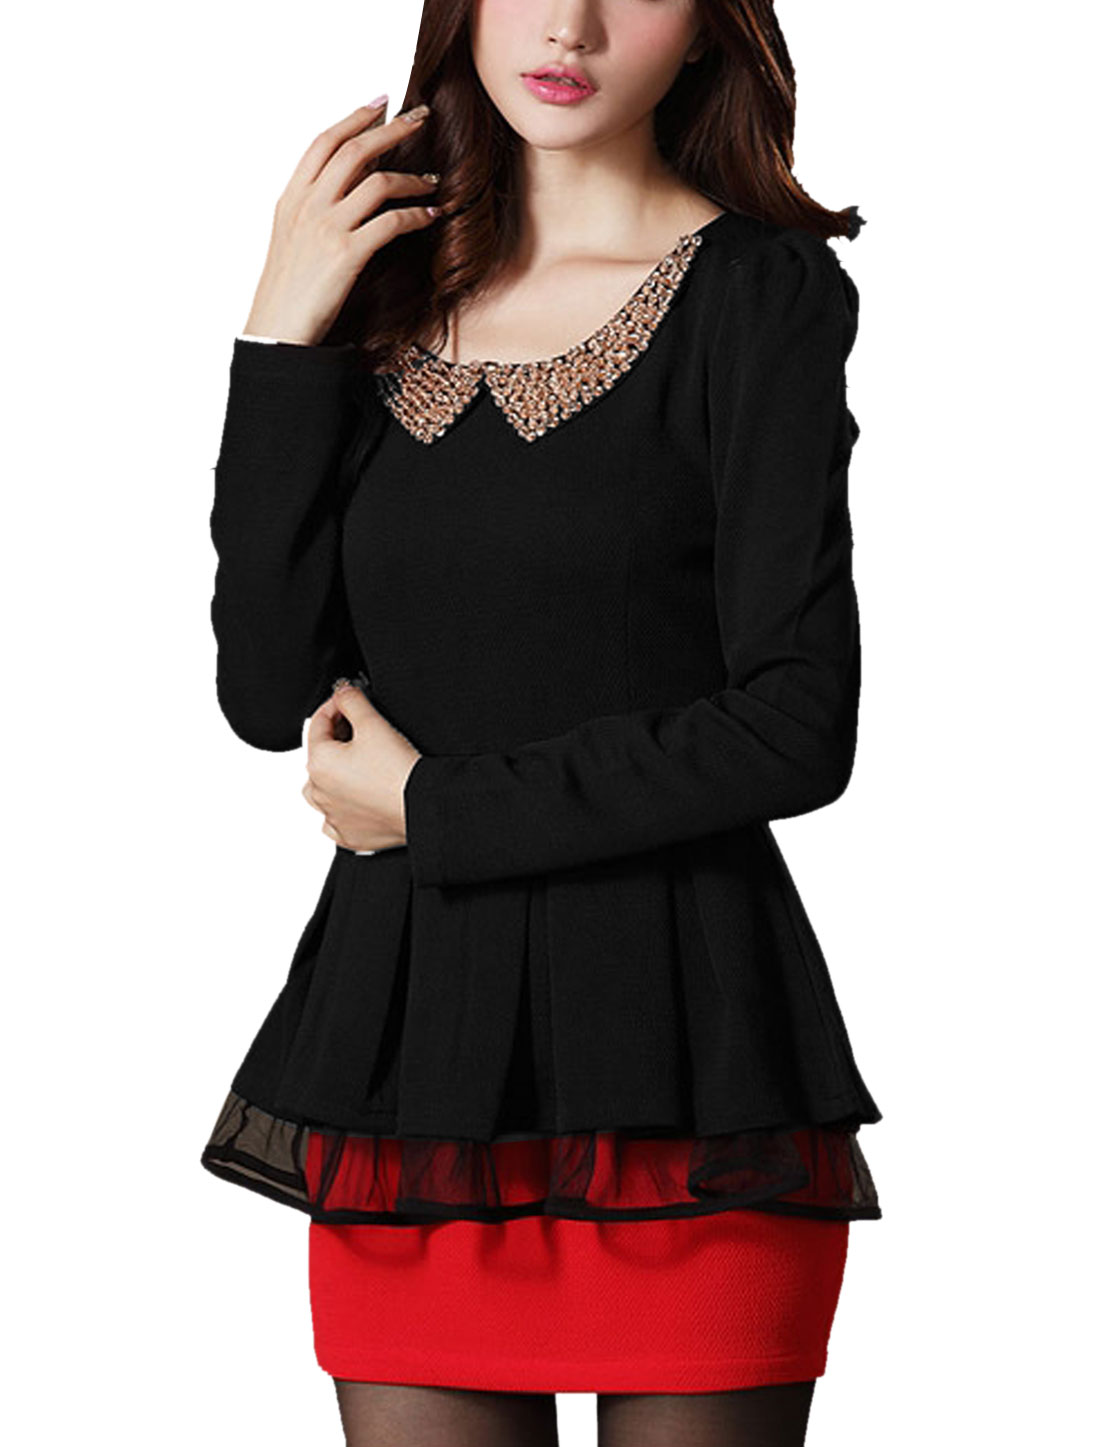 Lady Doll Collar Long Sleeve Fake Crystal Decor Peplum Top Black M